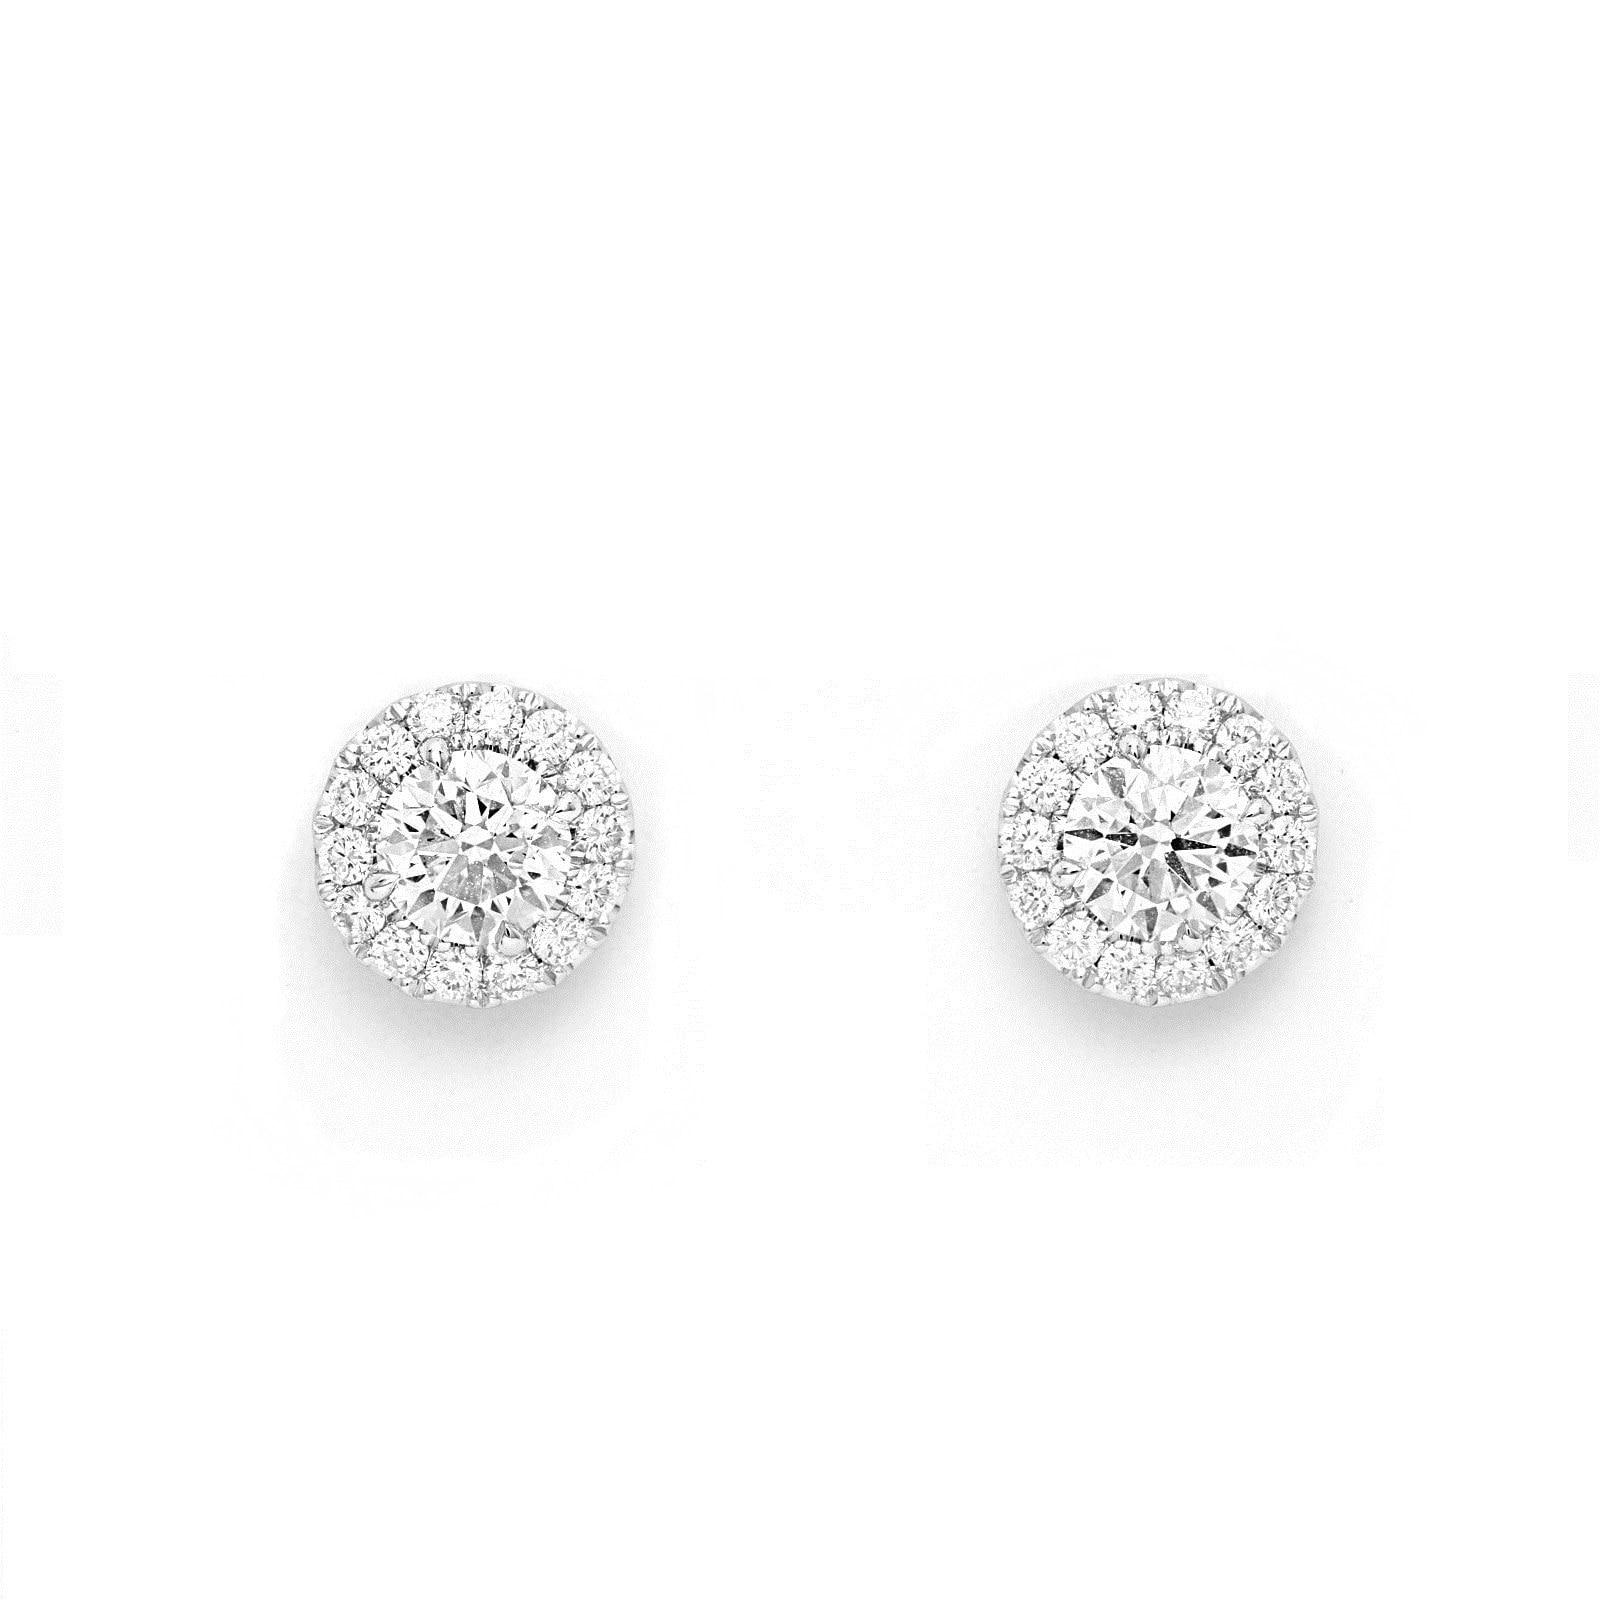 Mayors 18ct White Gold 1.50ct Single Halo Stud Earrings